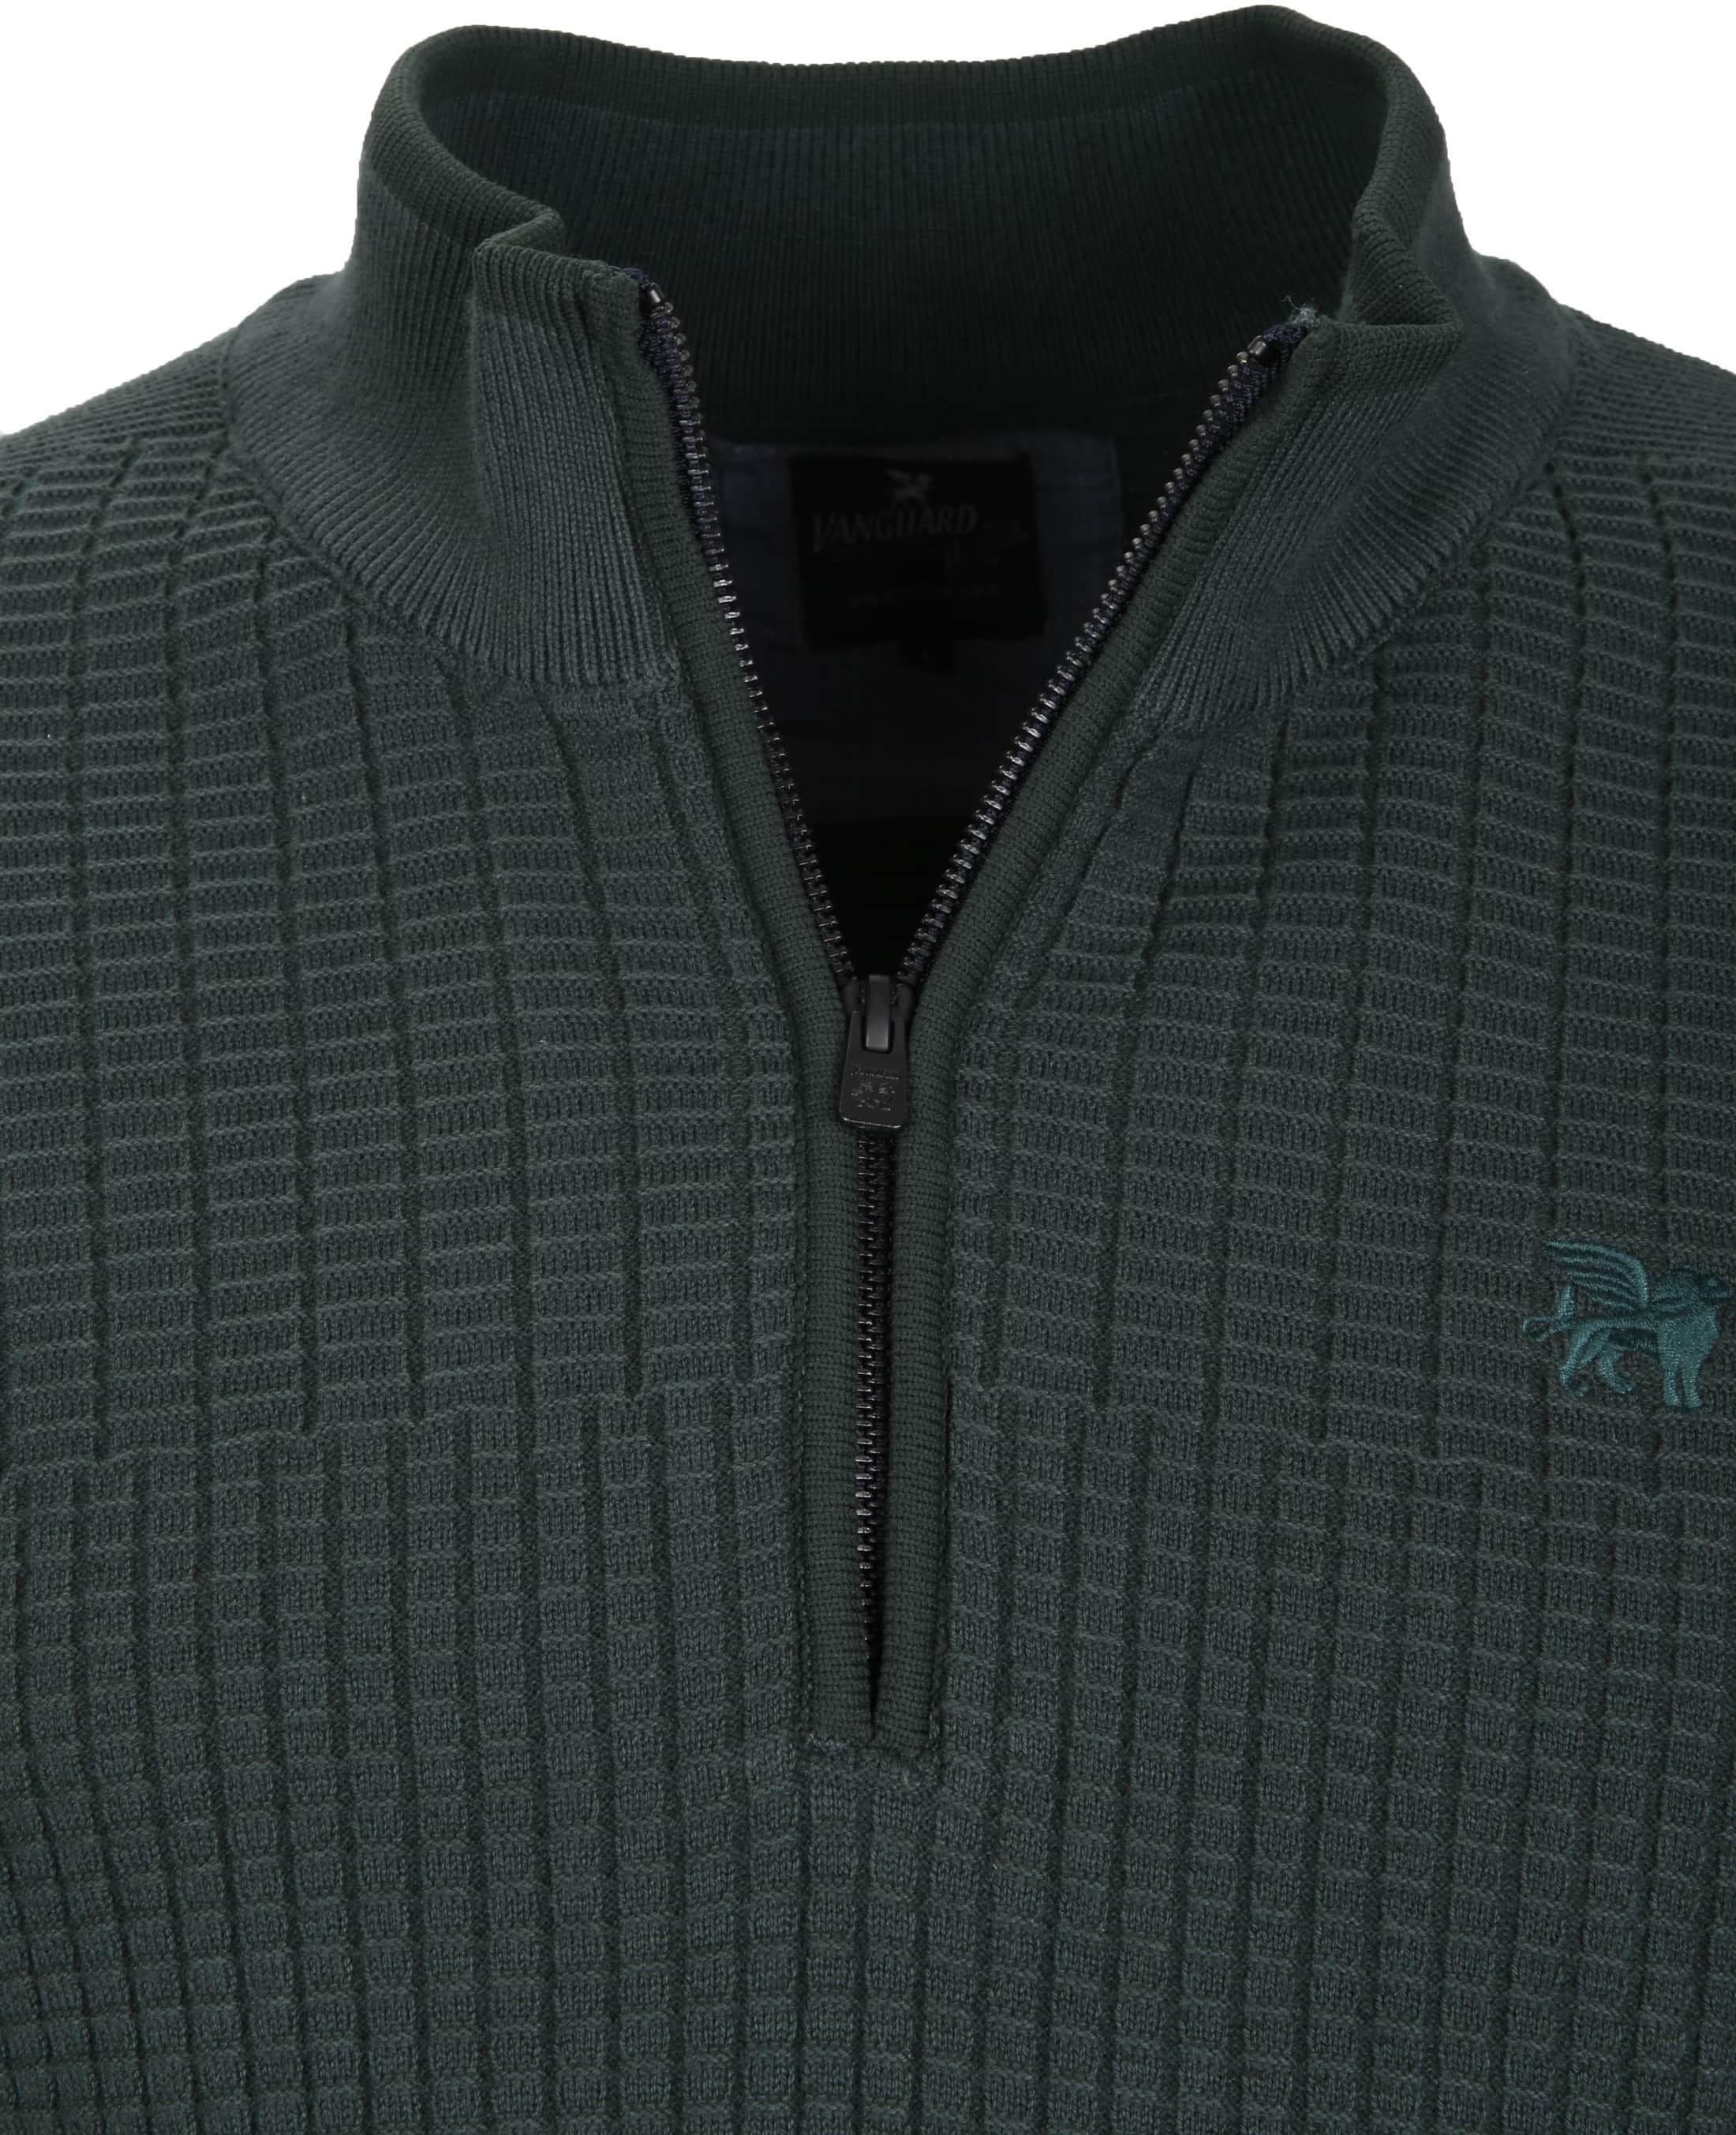 Vanguard Pullover Zipper Dark Green foto 1